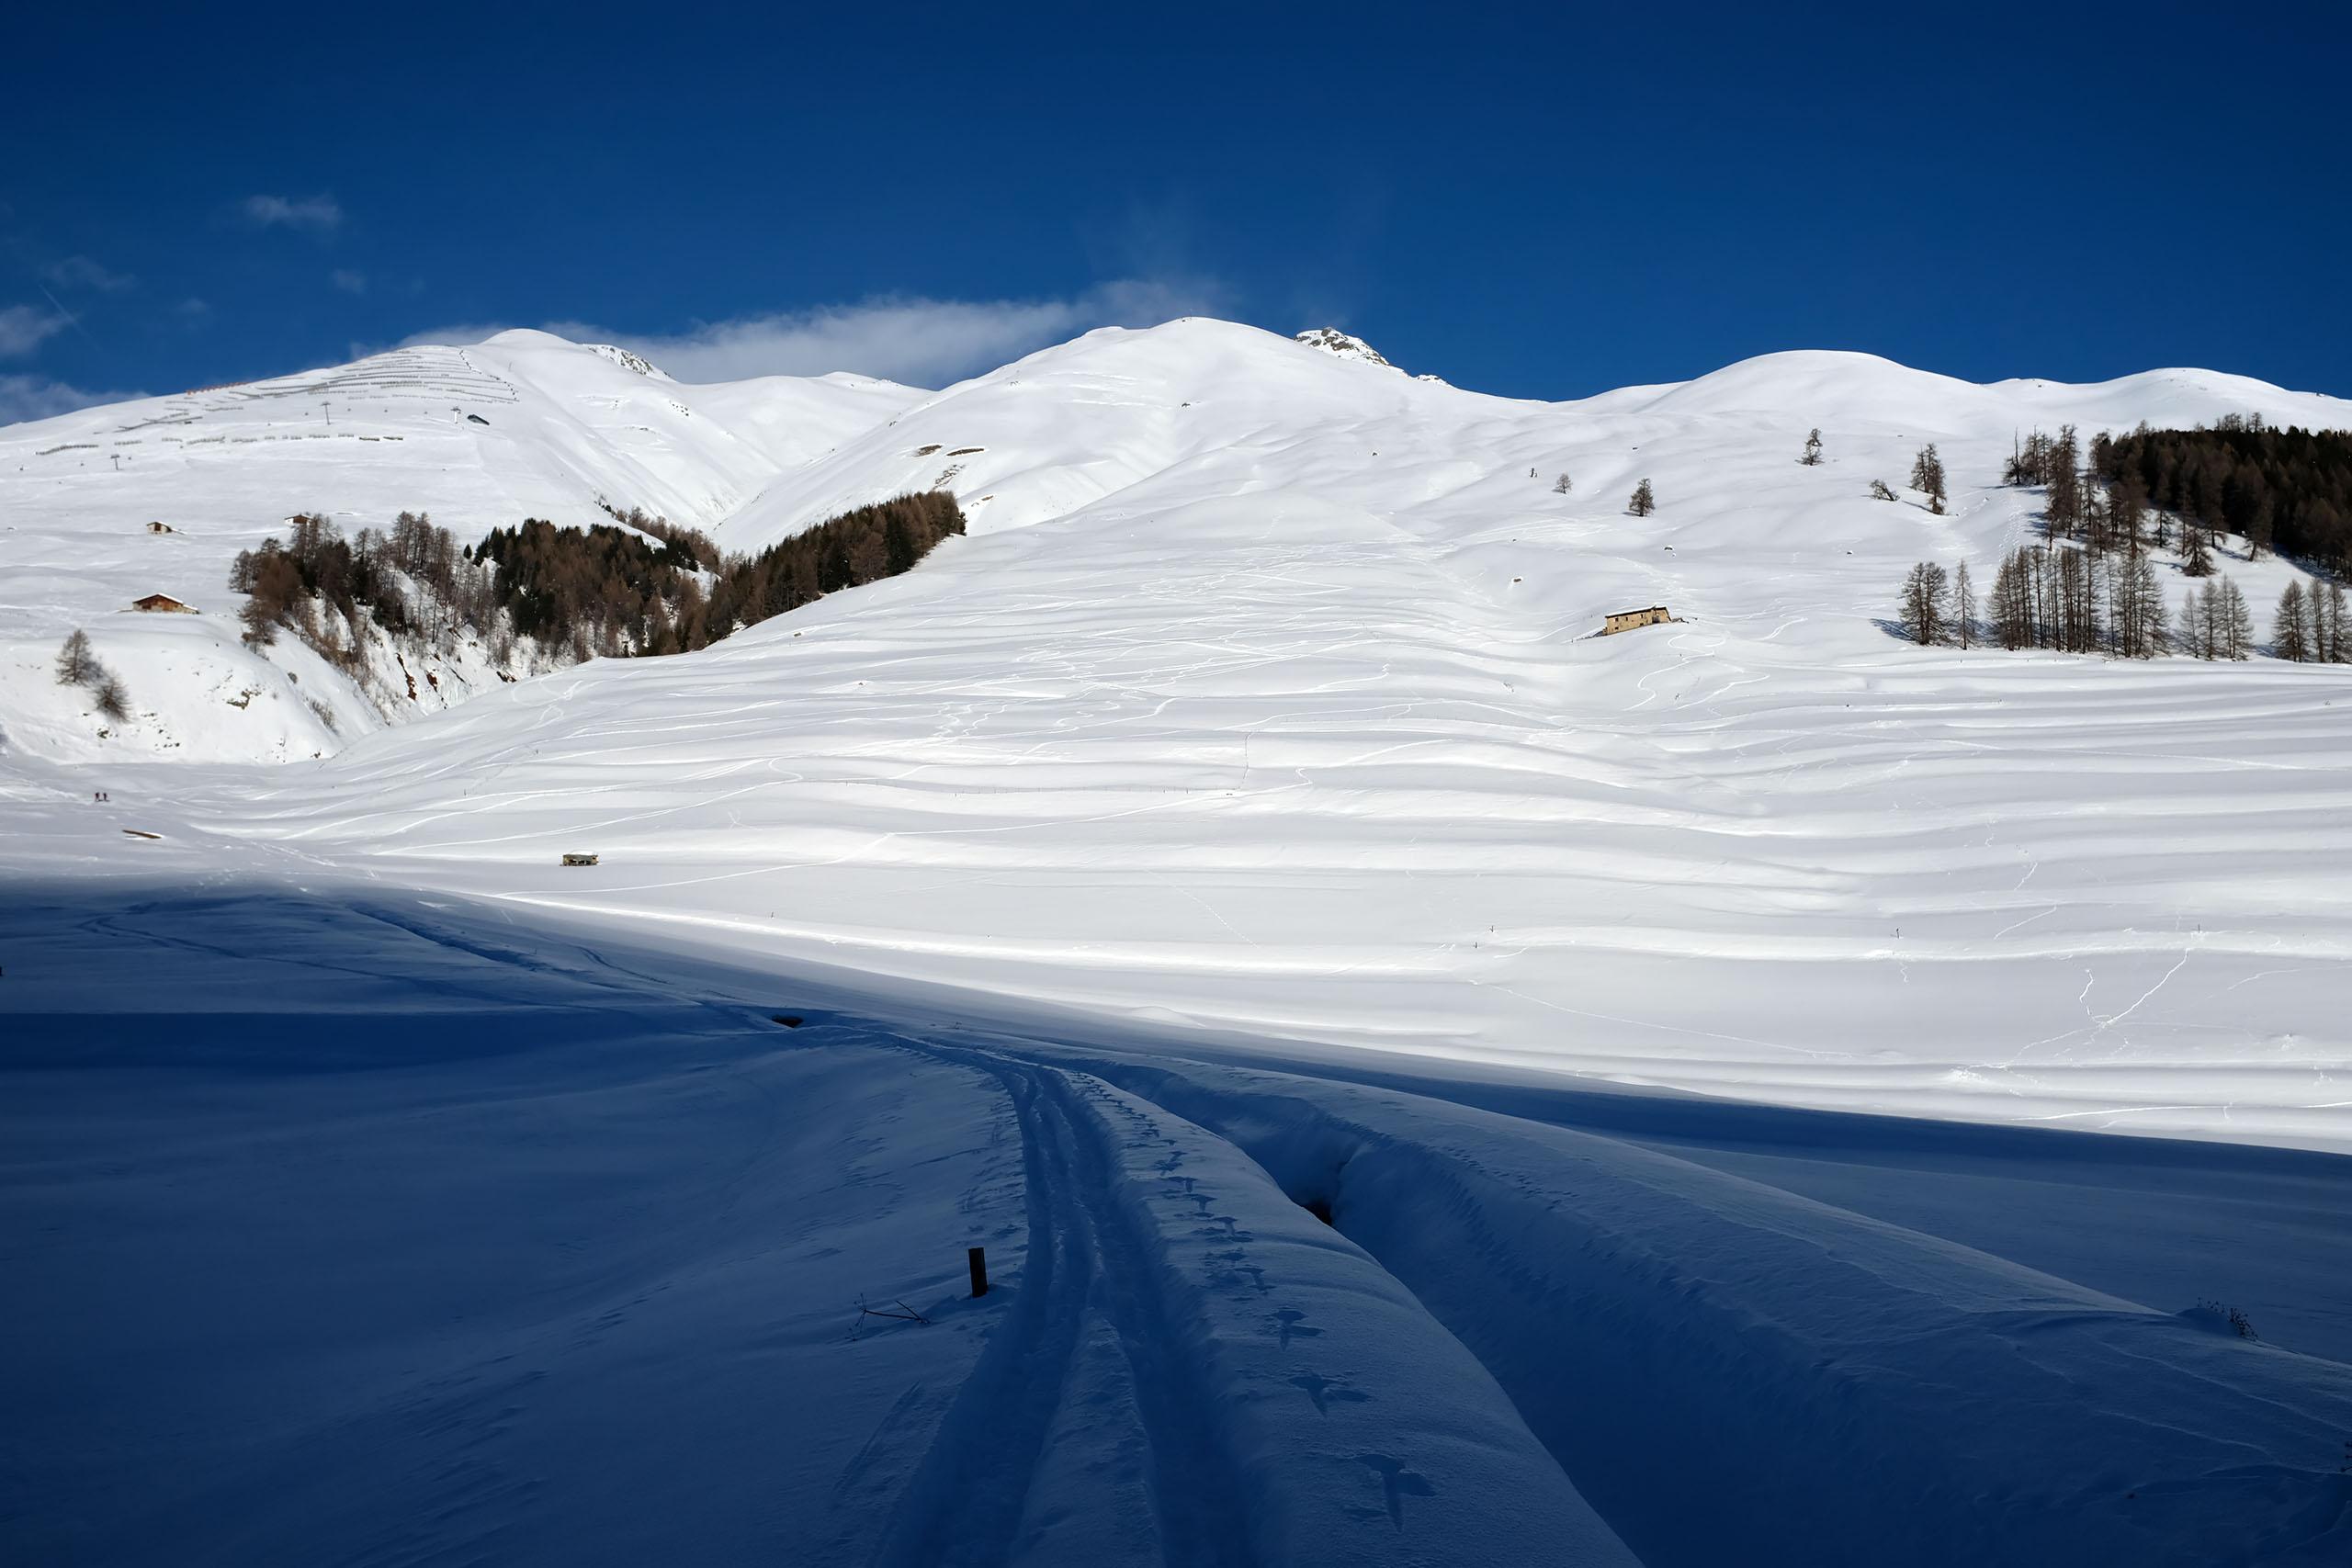 Scialpinismo al Piz Griatschouls: la partenza da Zuoz